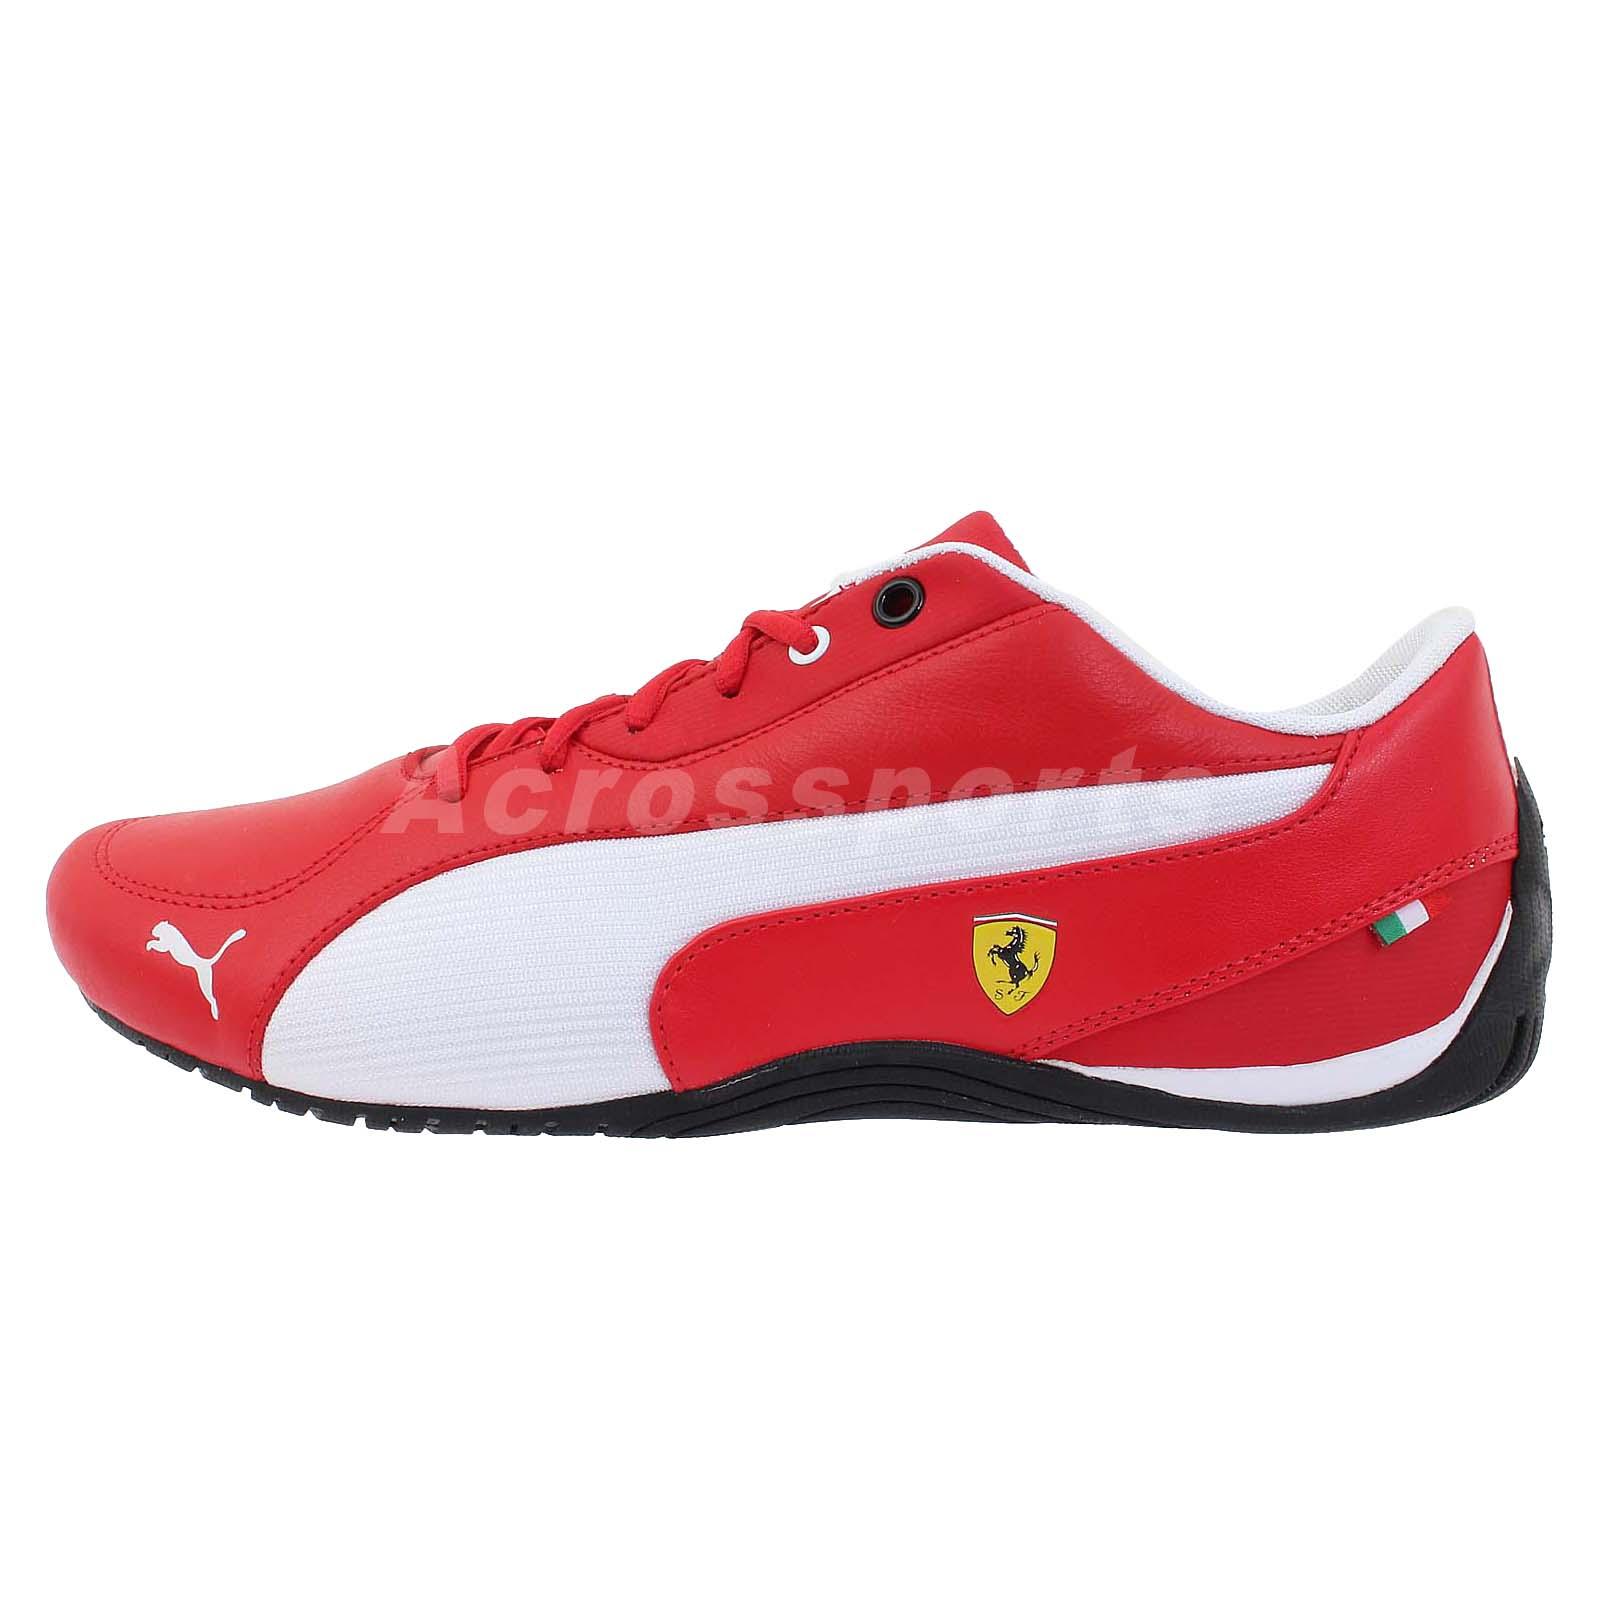 Puma Race Car Driving Shoes